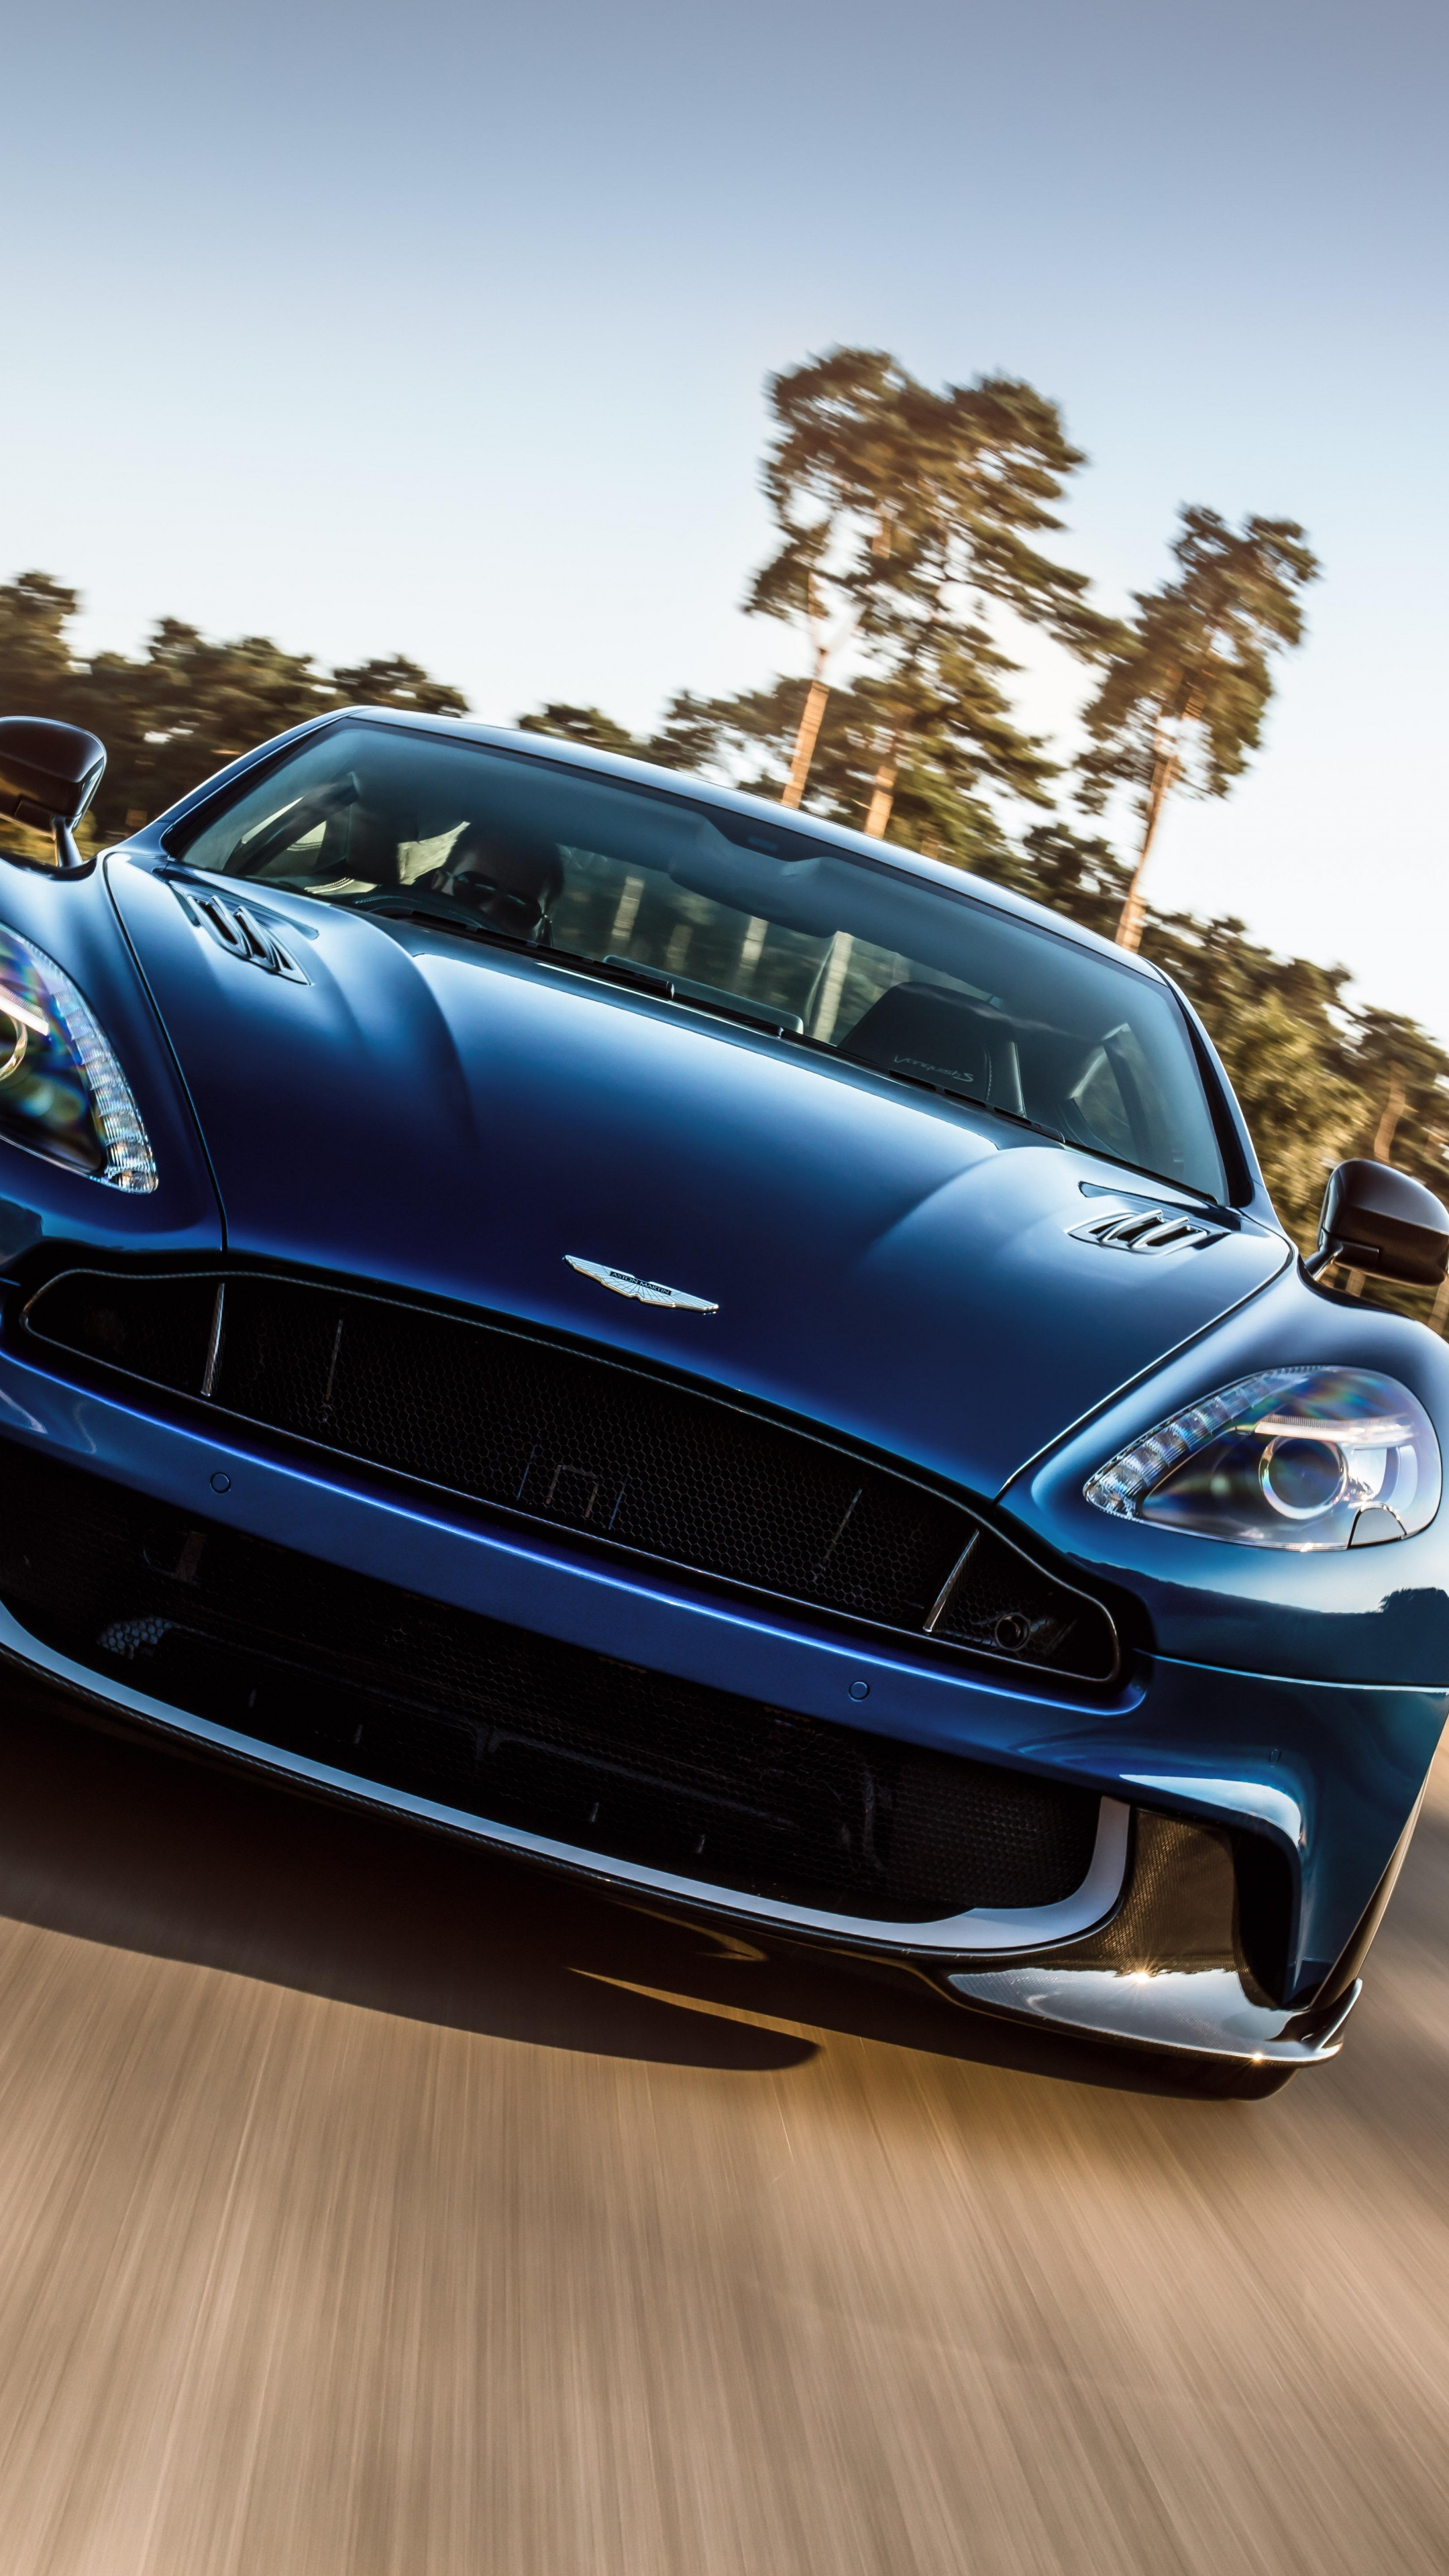 Wallpaper Aston Martin Vanquish Supercar La Auto Show